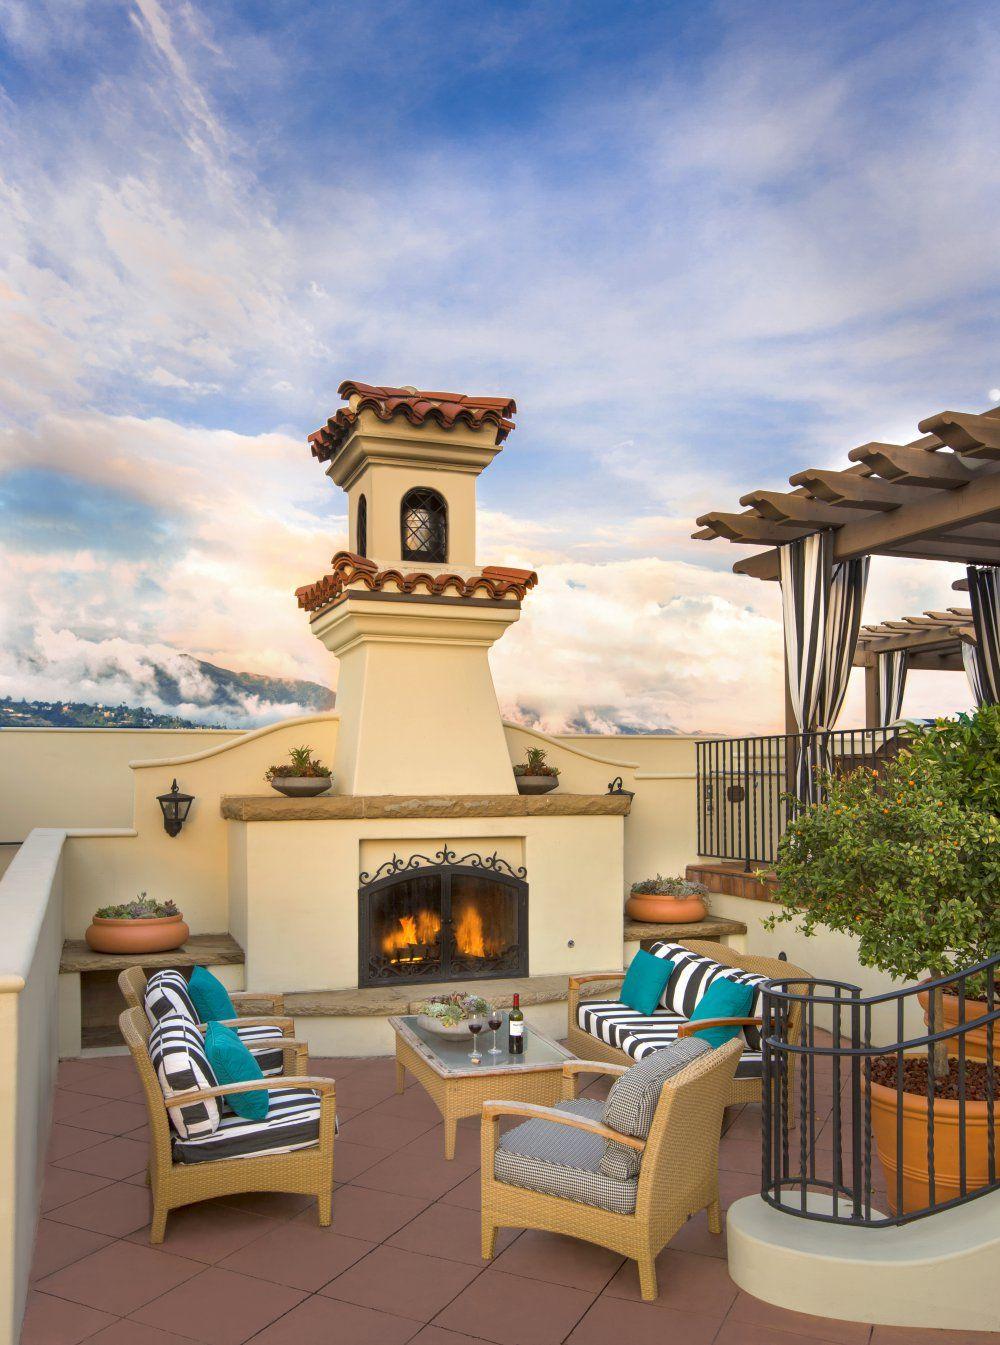 Canary Hotel A Luxury Kimpton Boutique Hotel In Santa Barbara Ca Santa Barbara Hotels Outdoor Fireplace Outdoor